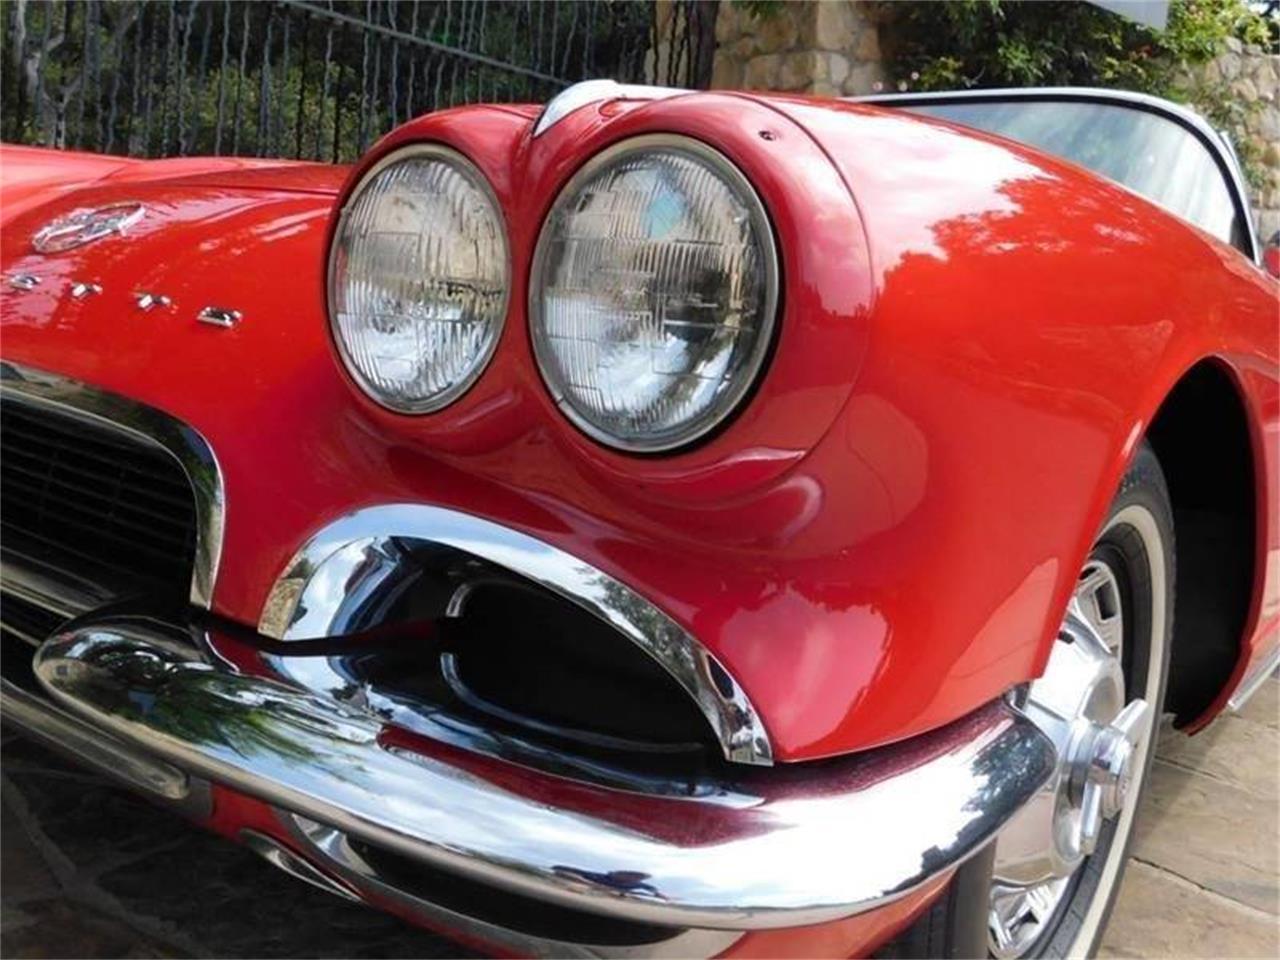 Large Picture of '62 Chevrolet Corvette - $85,995.00 Offered by Milpas Motors - QMUZ